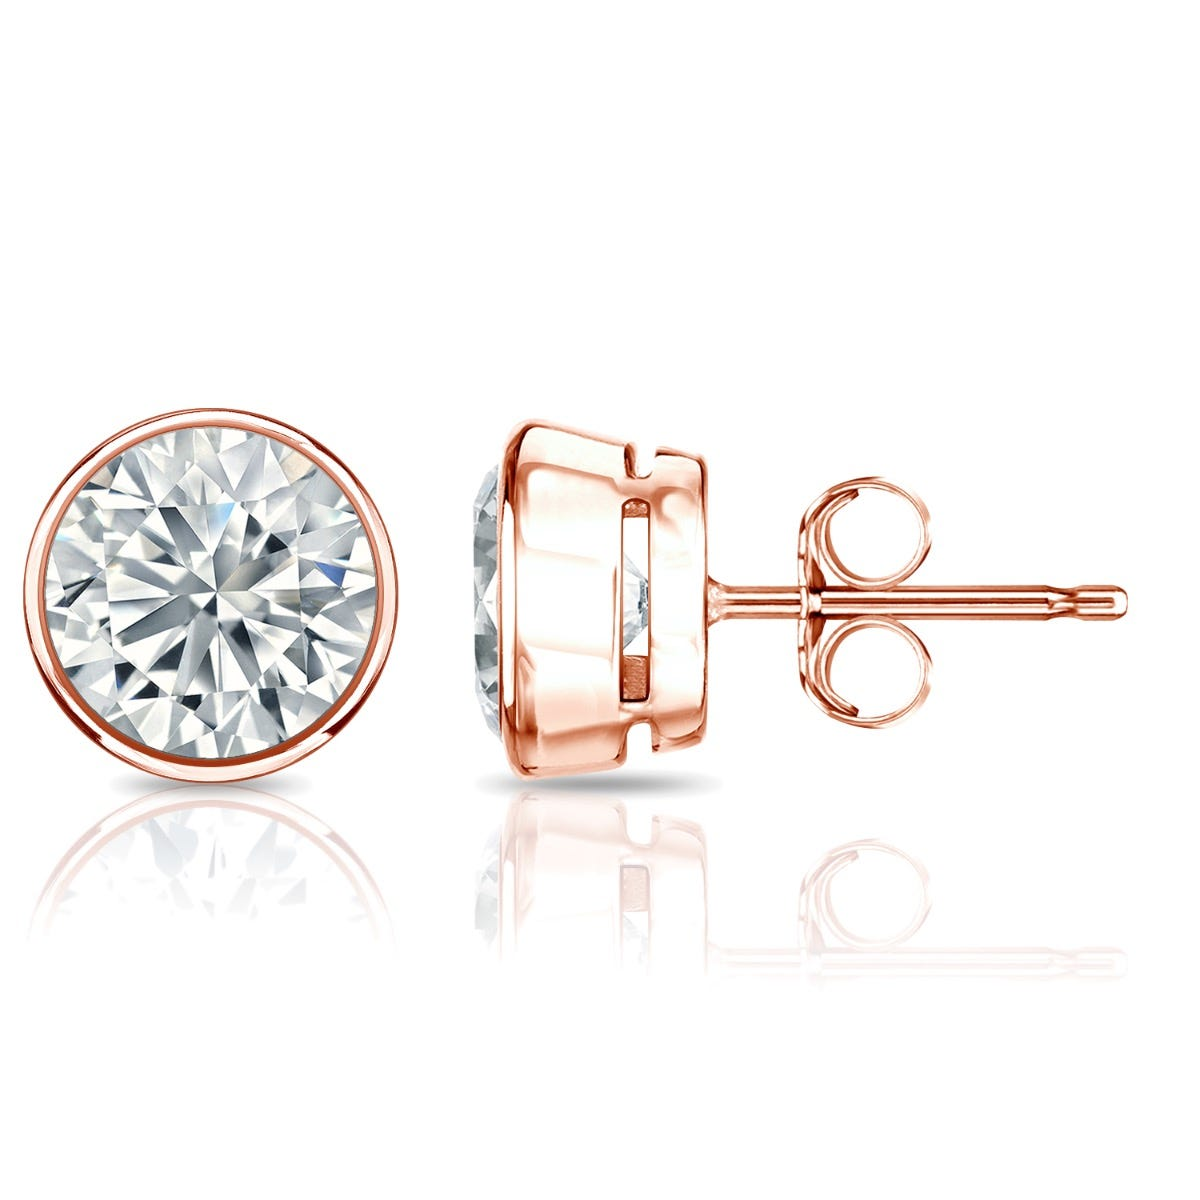 Diamond Round Bezel-Set 2ctw. Solitaire Stud (IJ-I1) Earrings in 14K Rose Gold